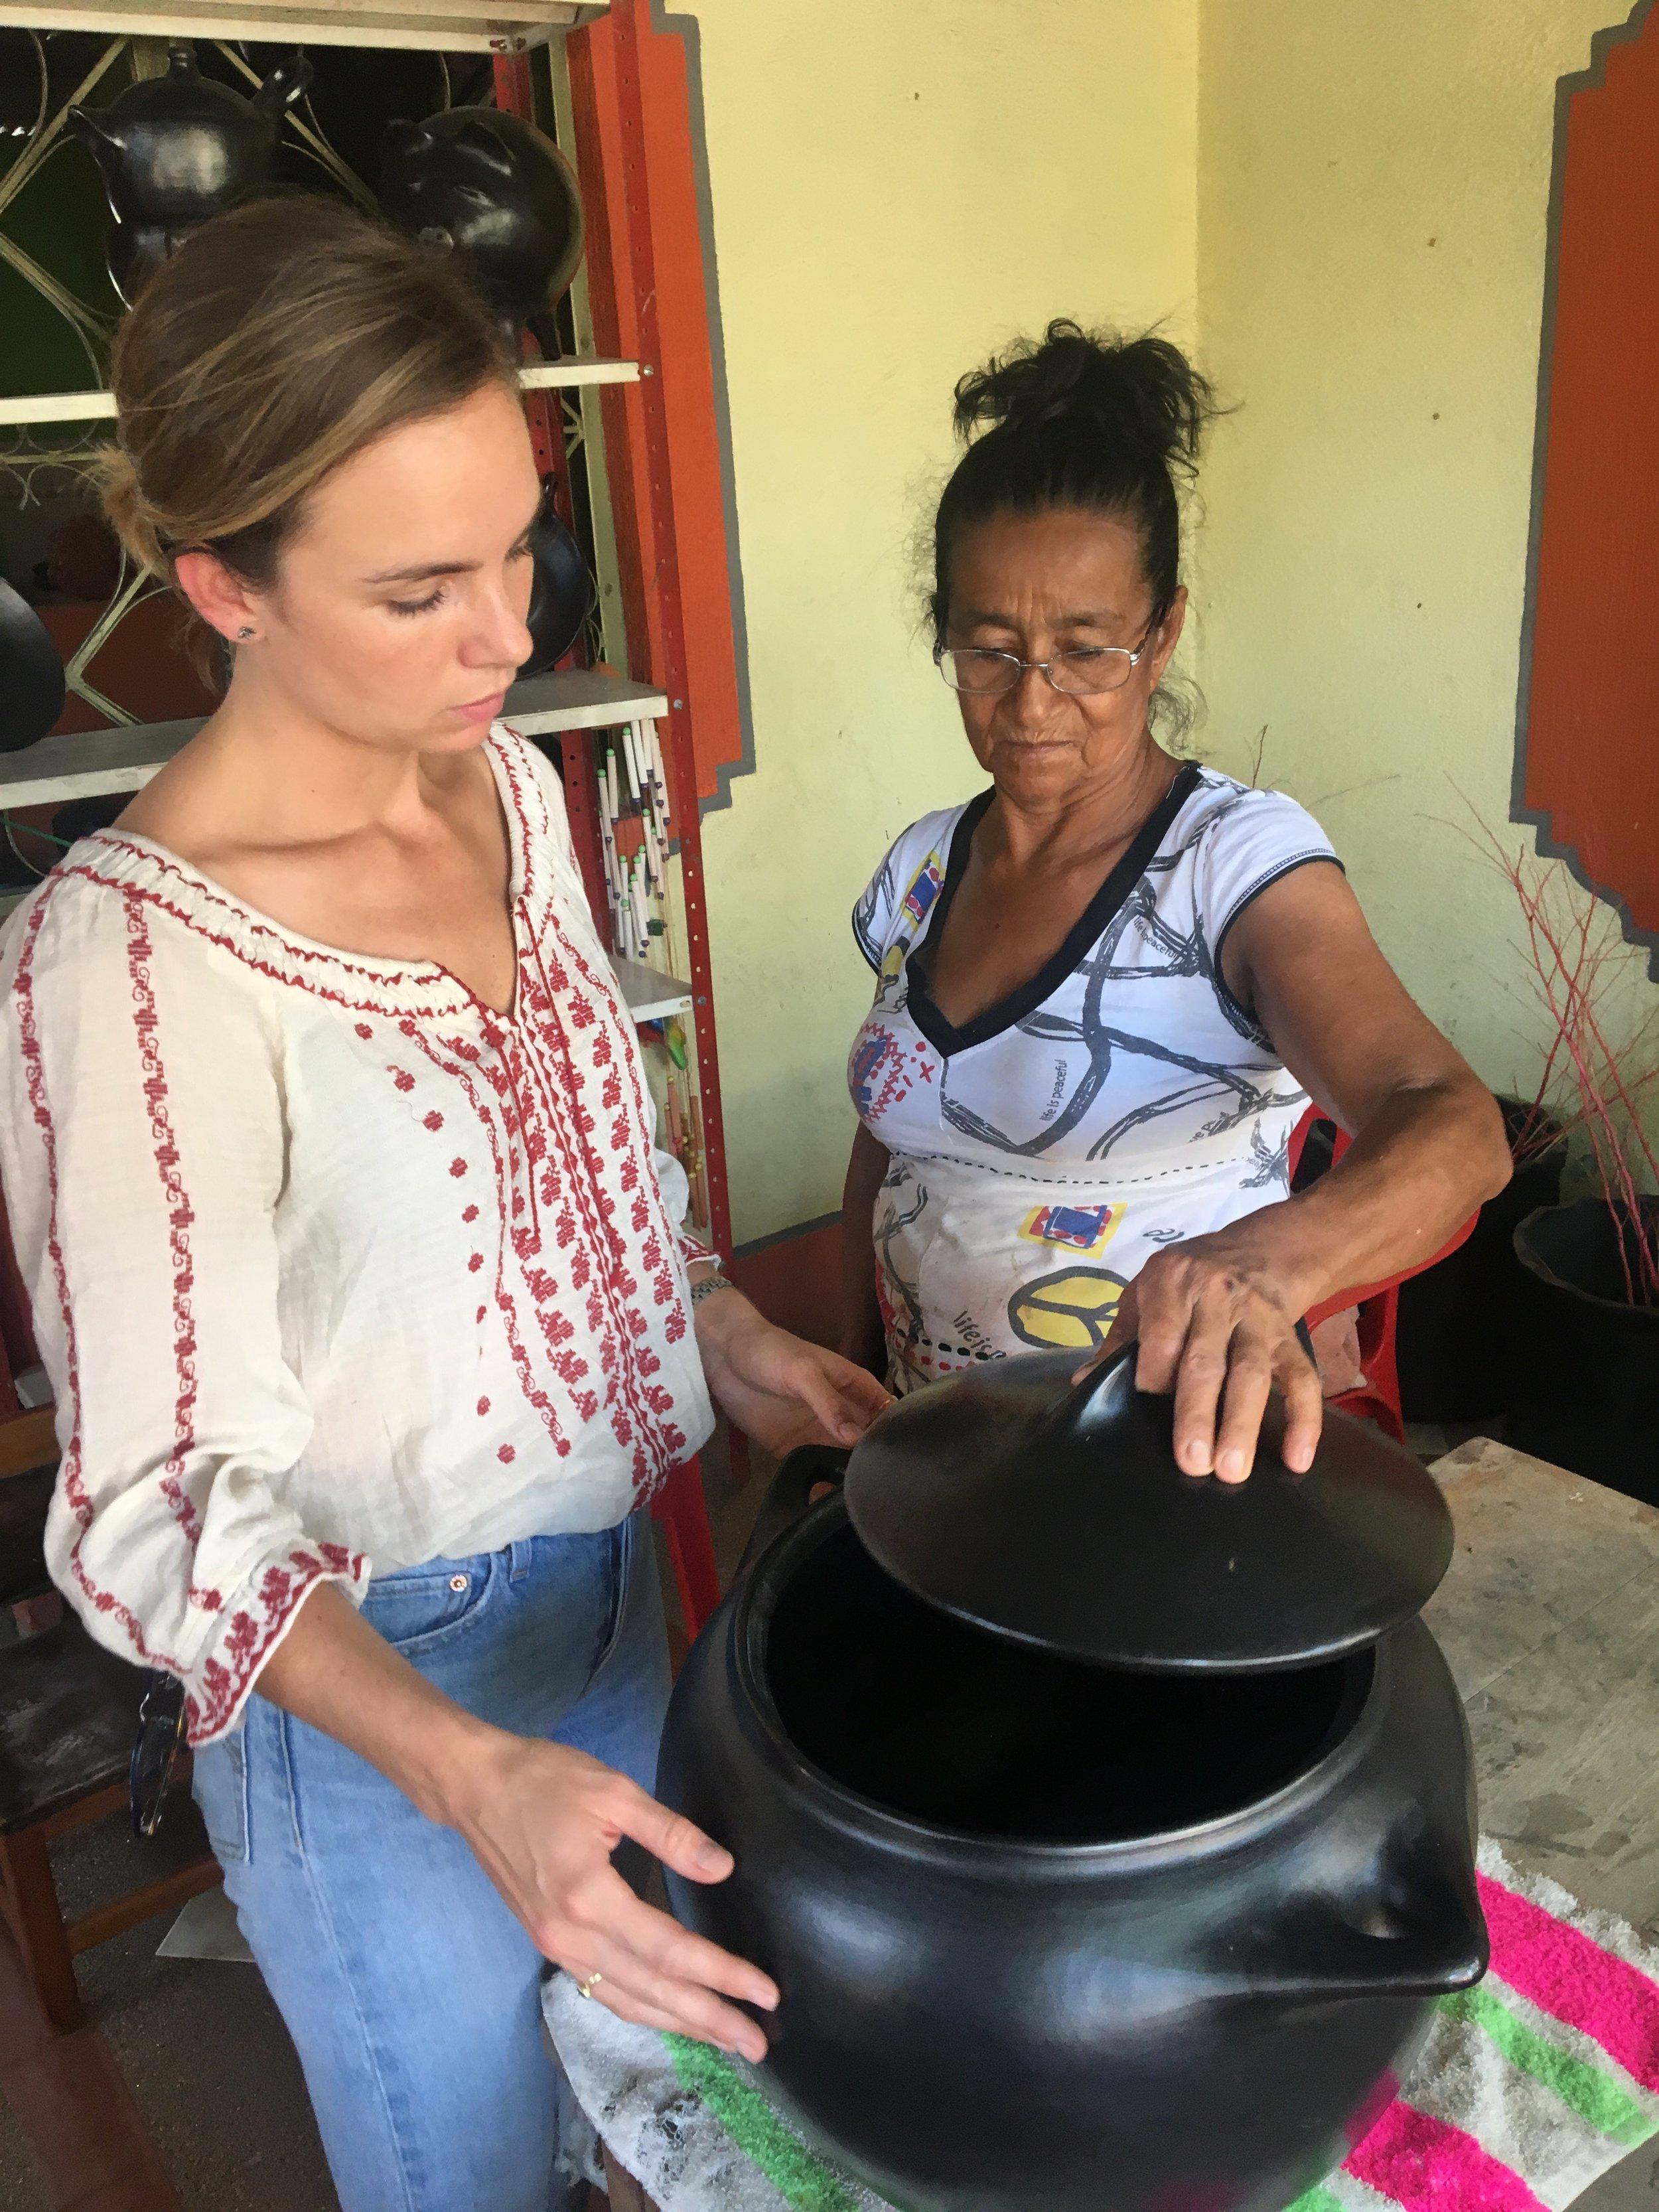 Malachi working with ceramicist Carmen.